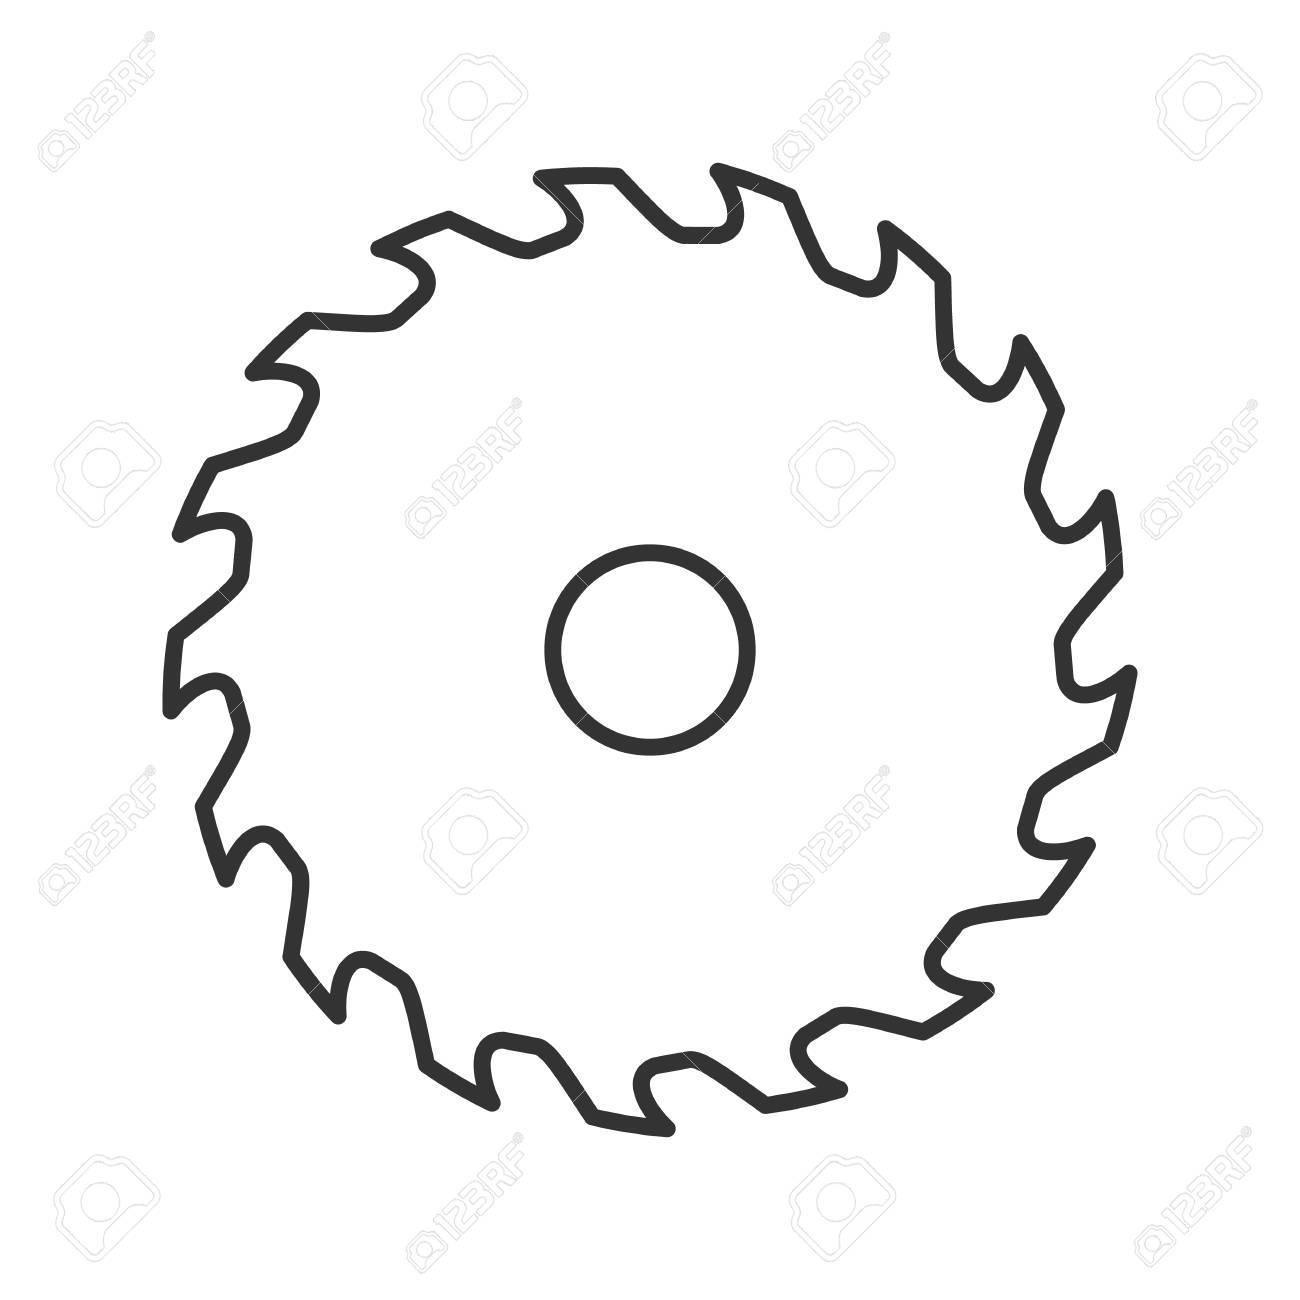 circular saw blade linear icon thin line illustration wheel rh 123rf com circular saw blade clipart free table saw blade clipart